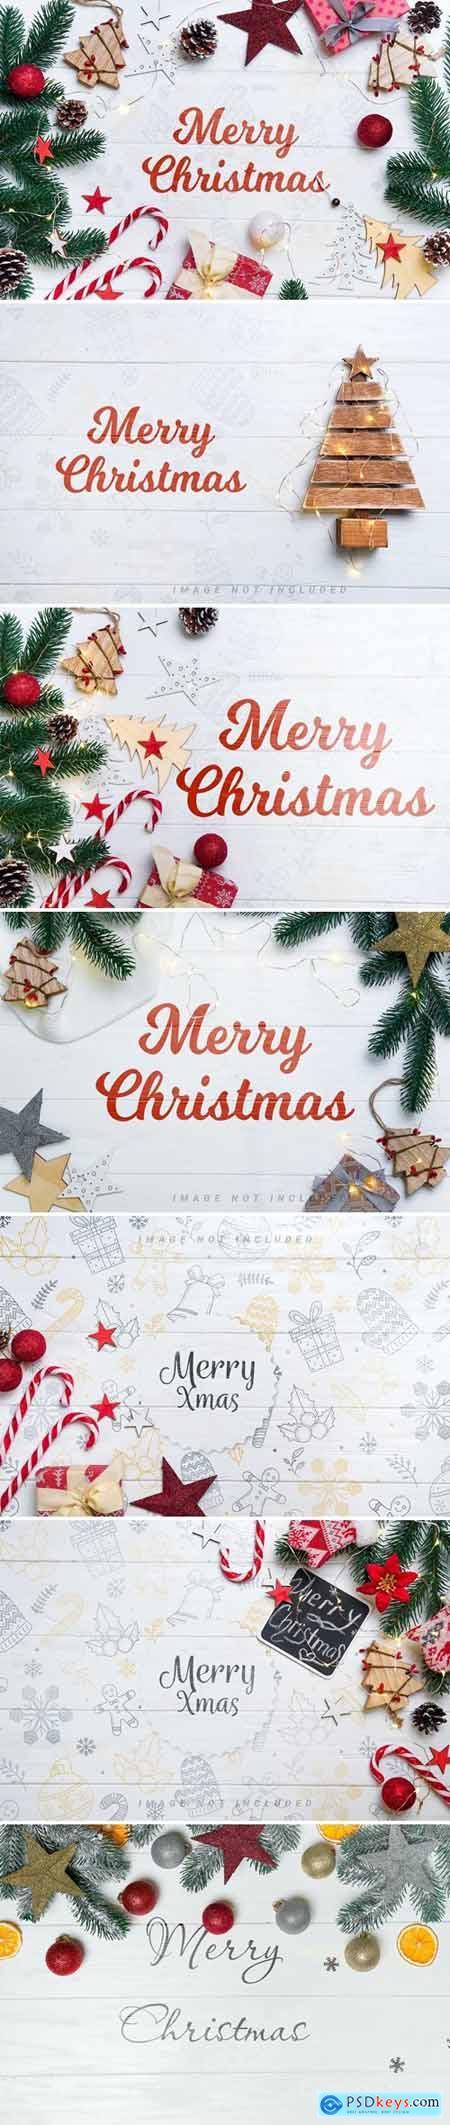 Christmas background mockup on wooden